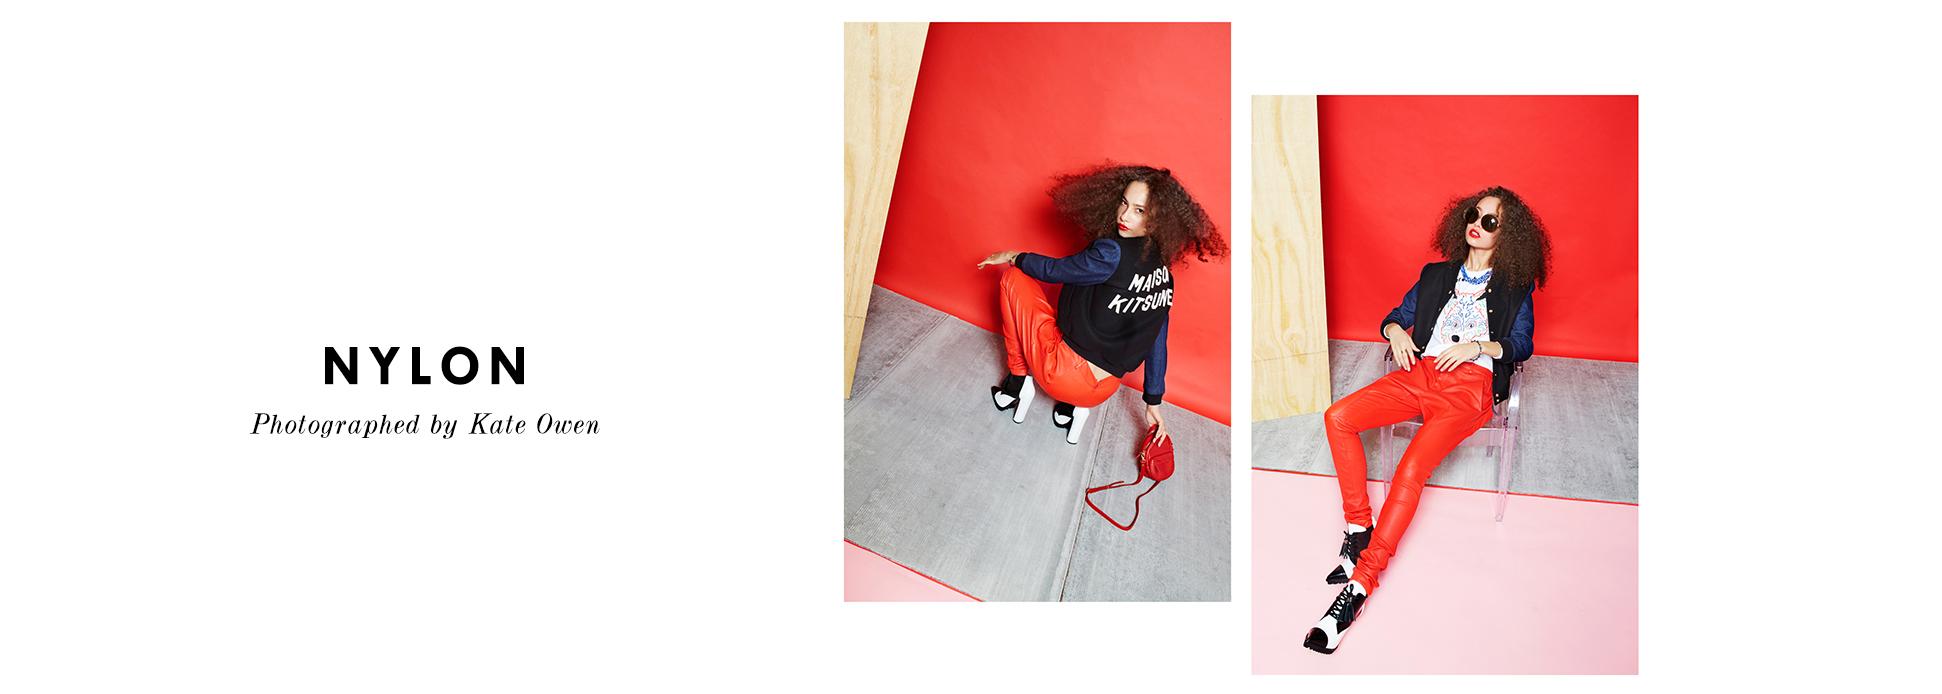 Nylon-magazine-usa-banner-Andrea-messier-cuomo-6.jpg